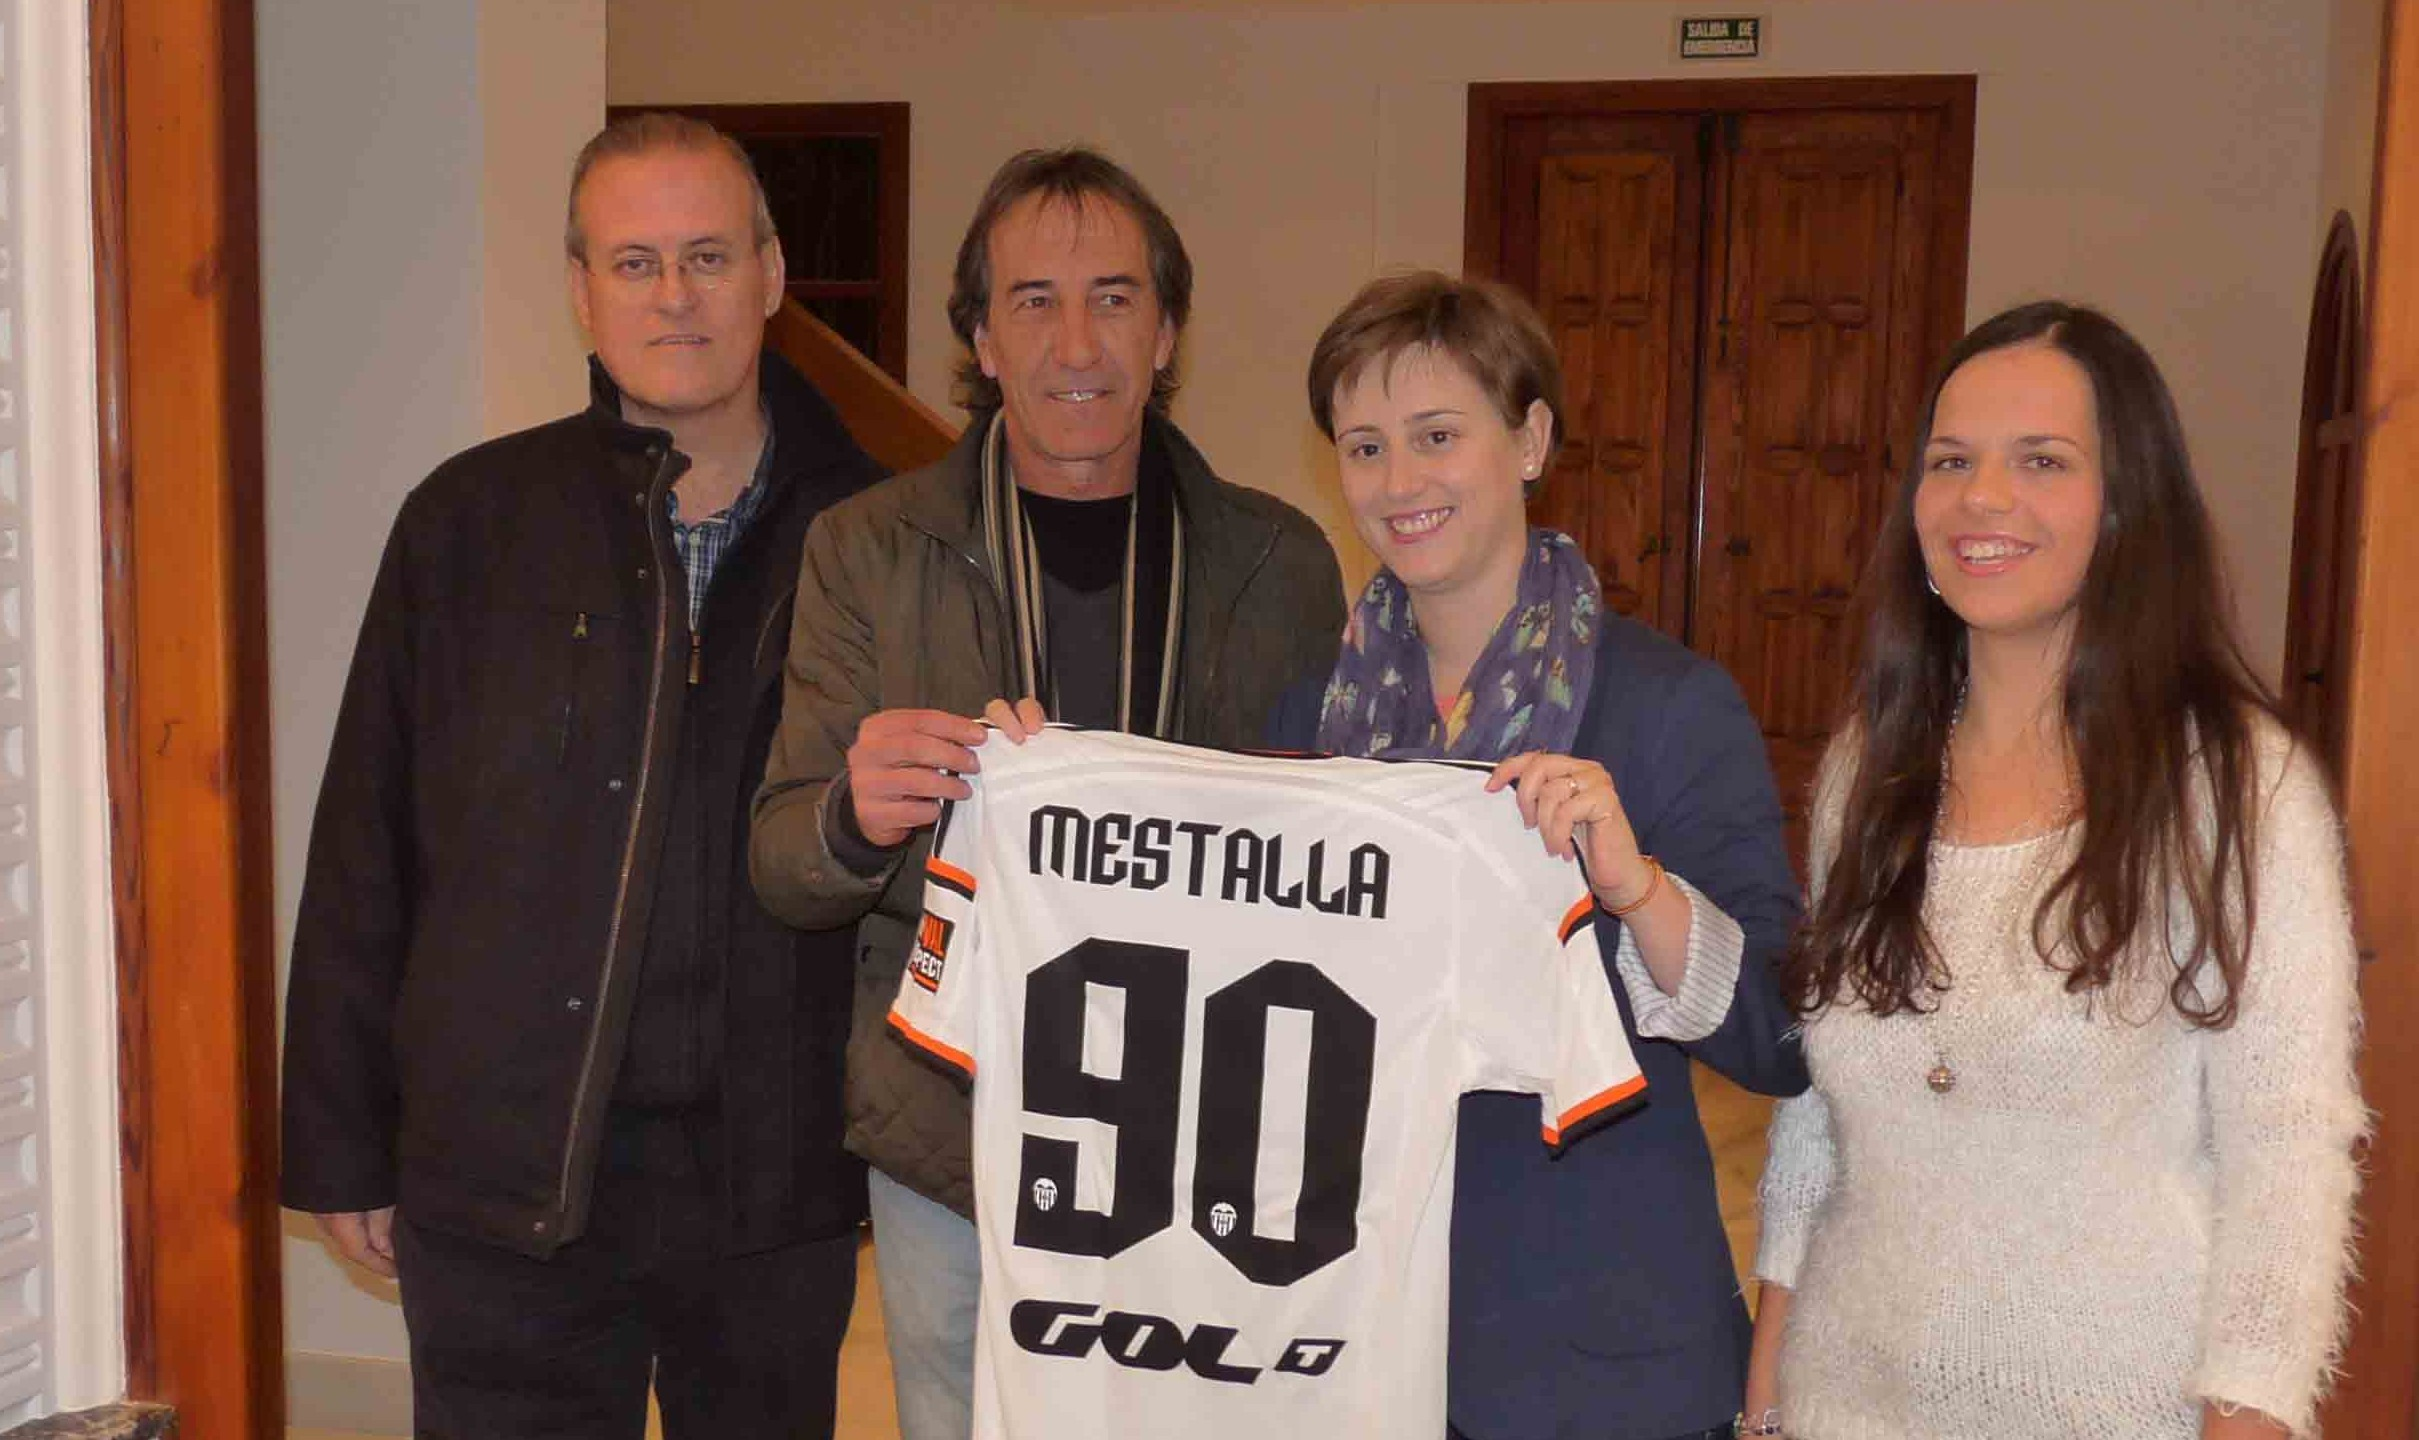 Benetússer rinde homenaje a Mestalla